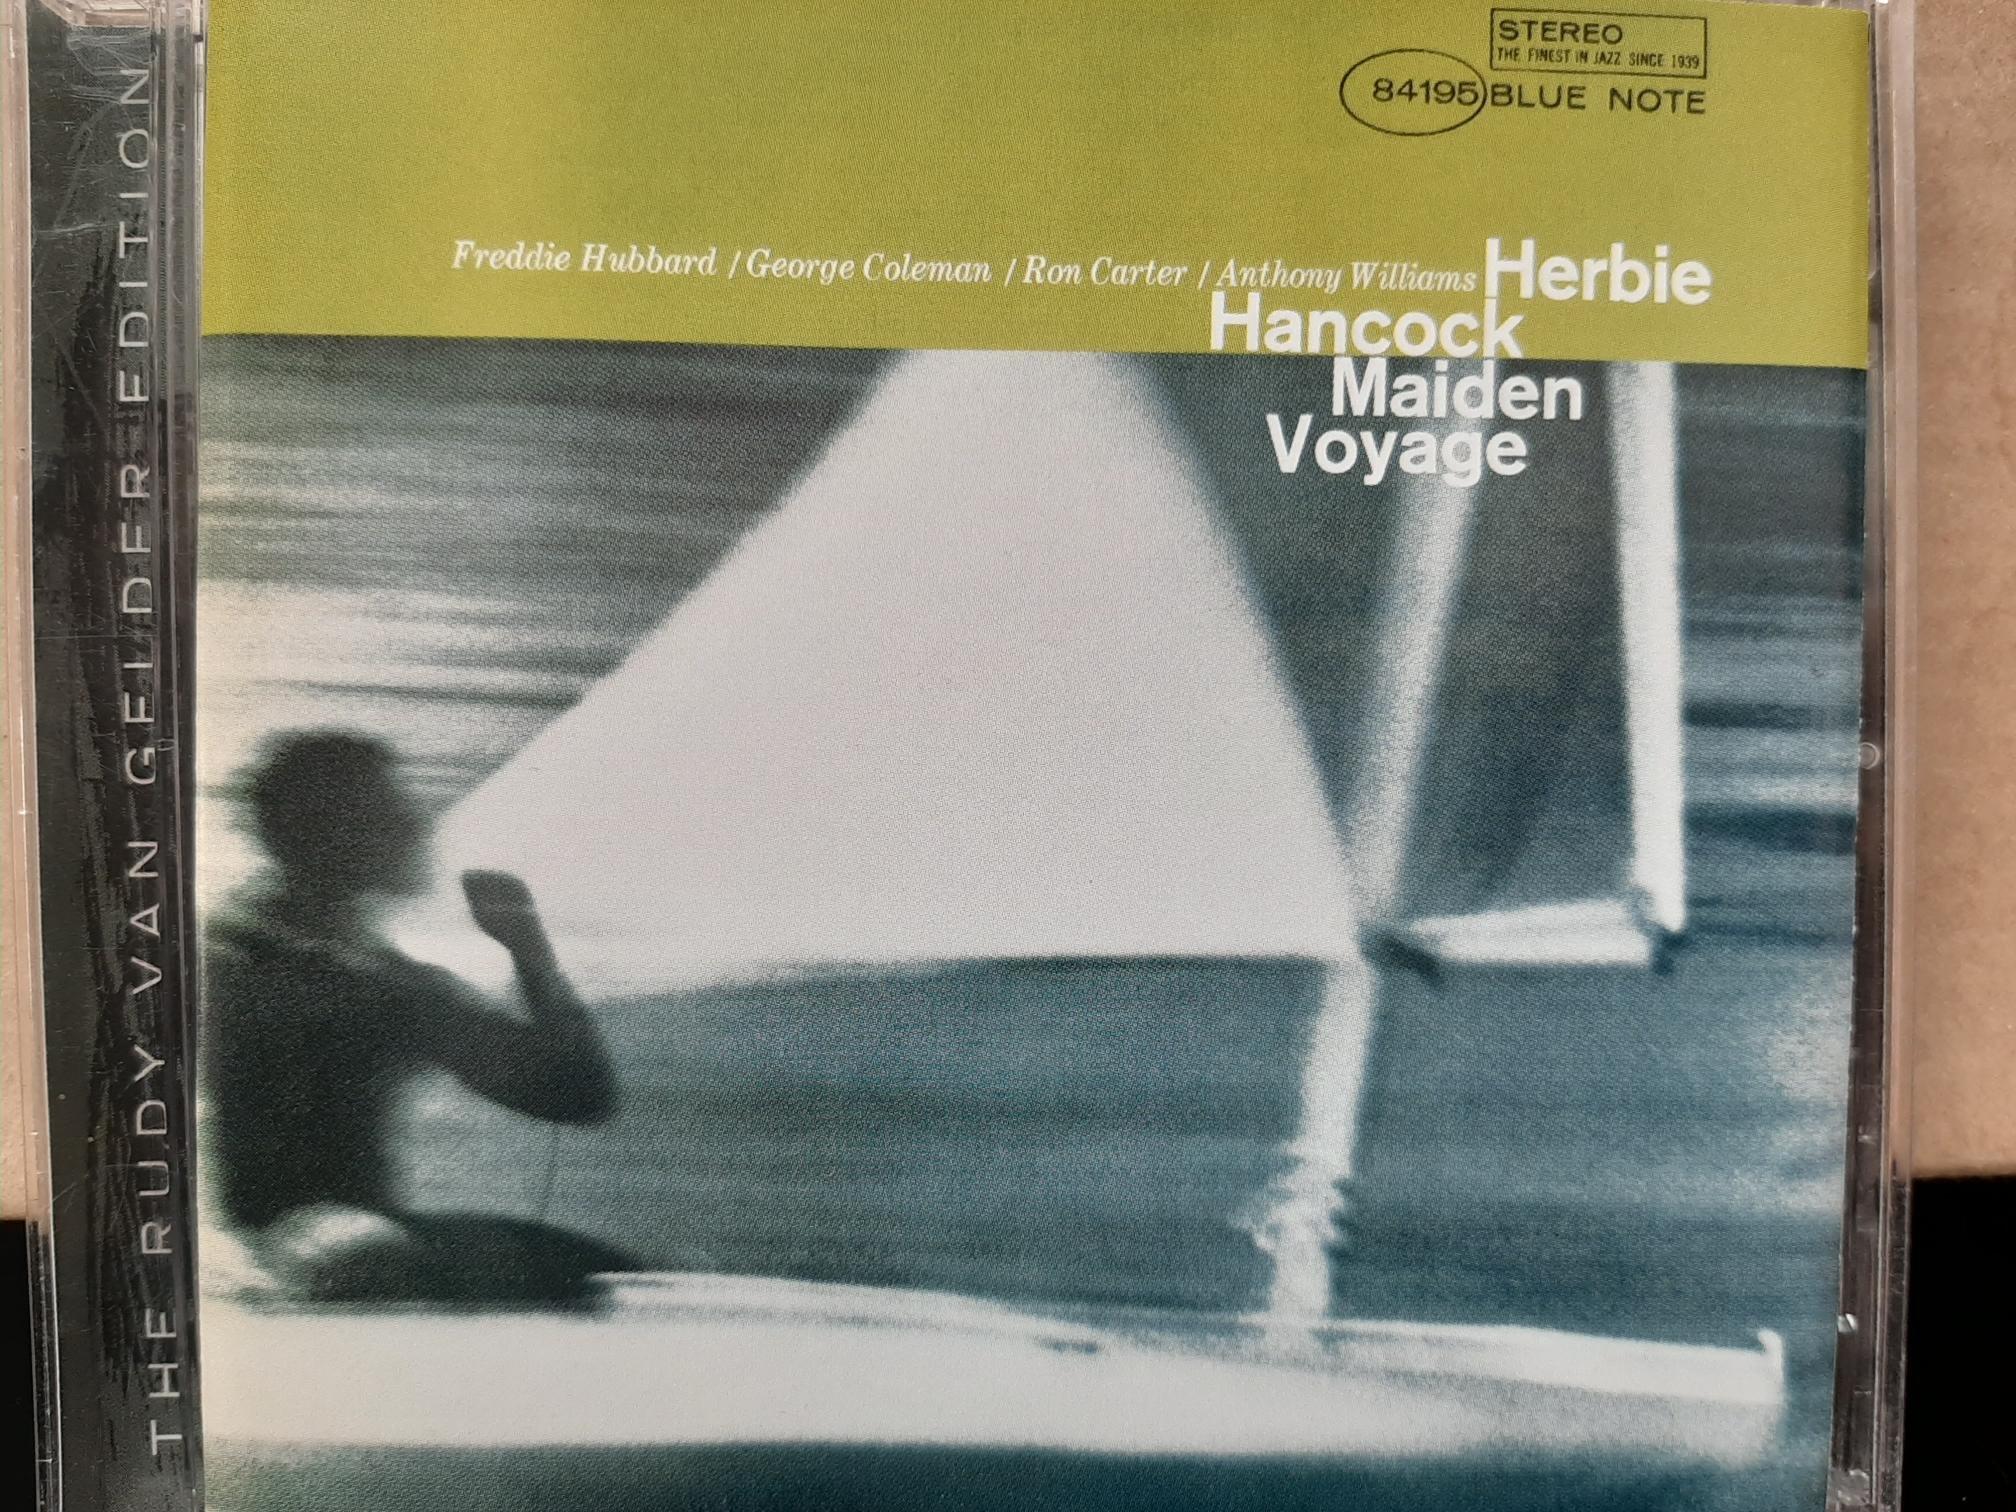 Herbie Hancock~Maiden Voyage,胡比漢考克~處女航。